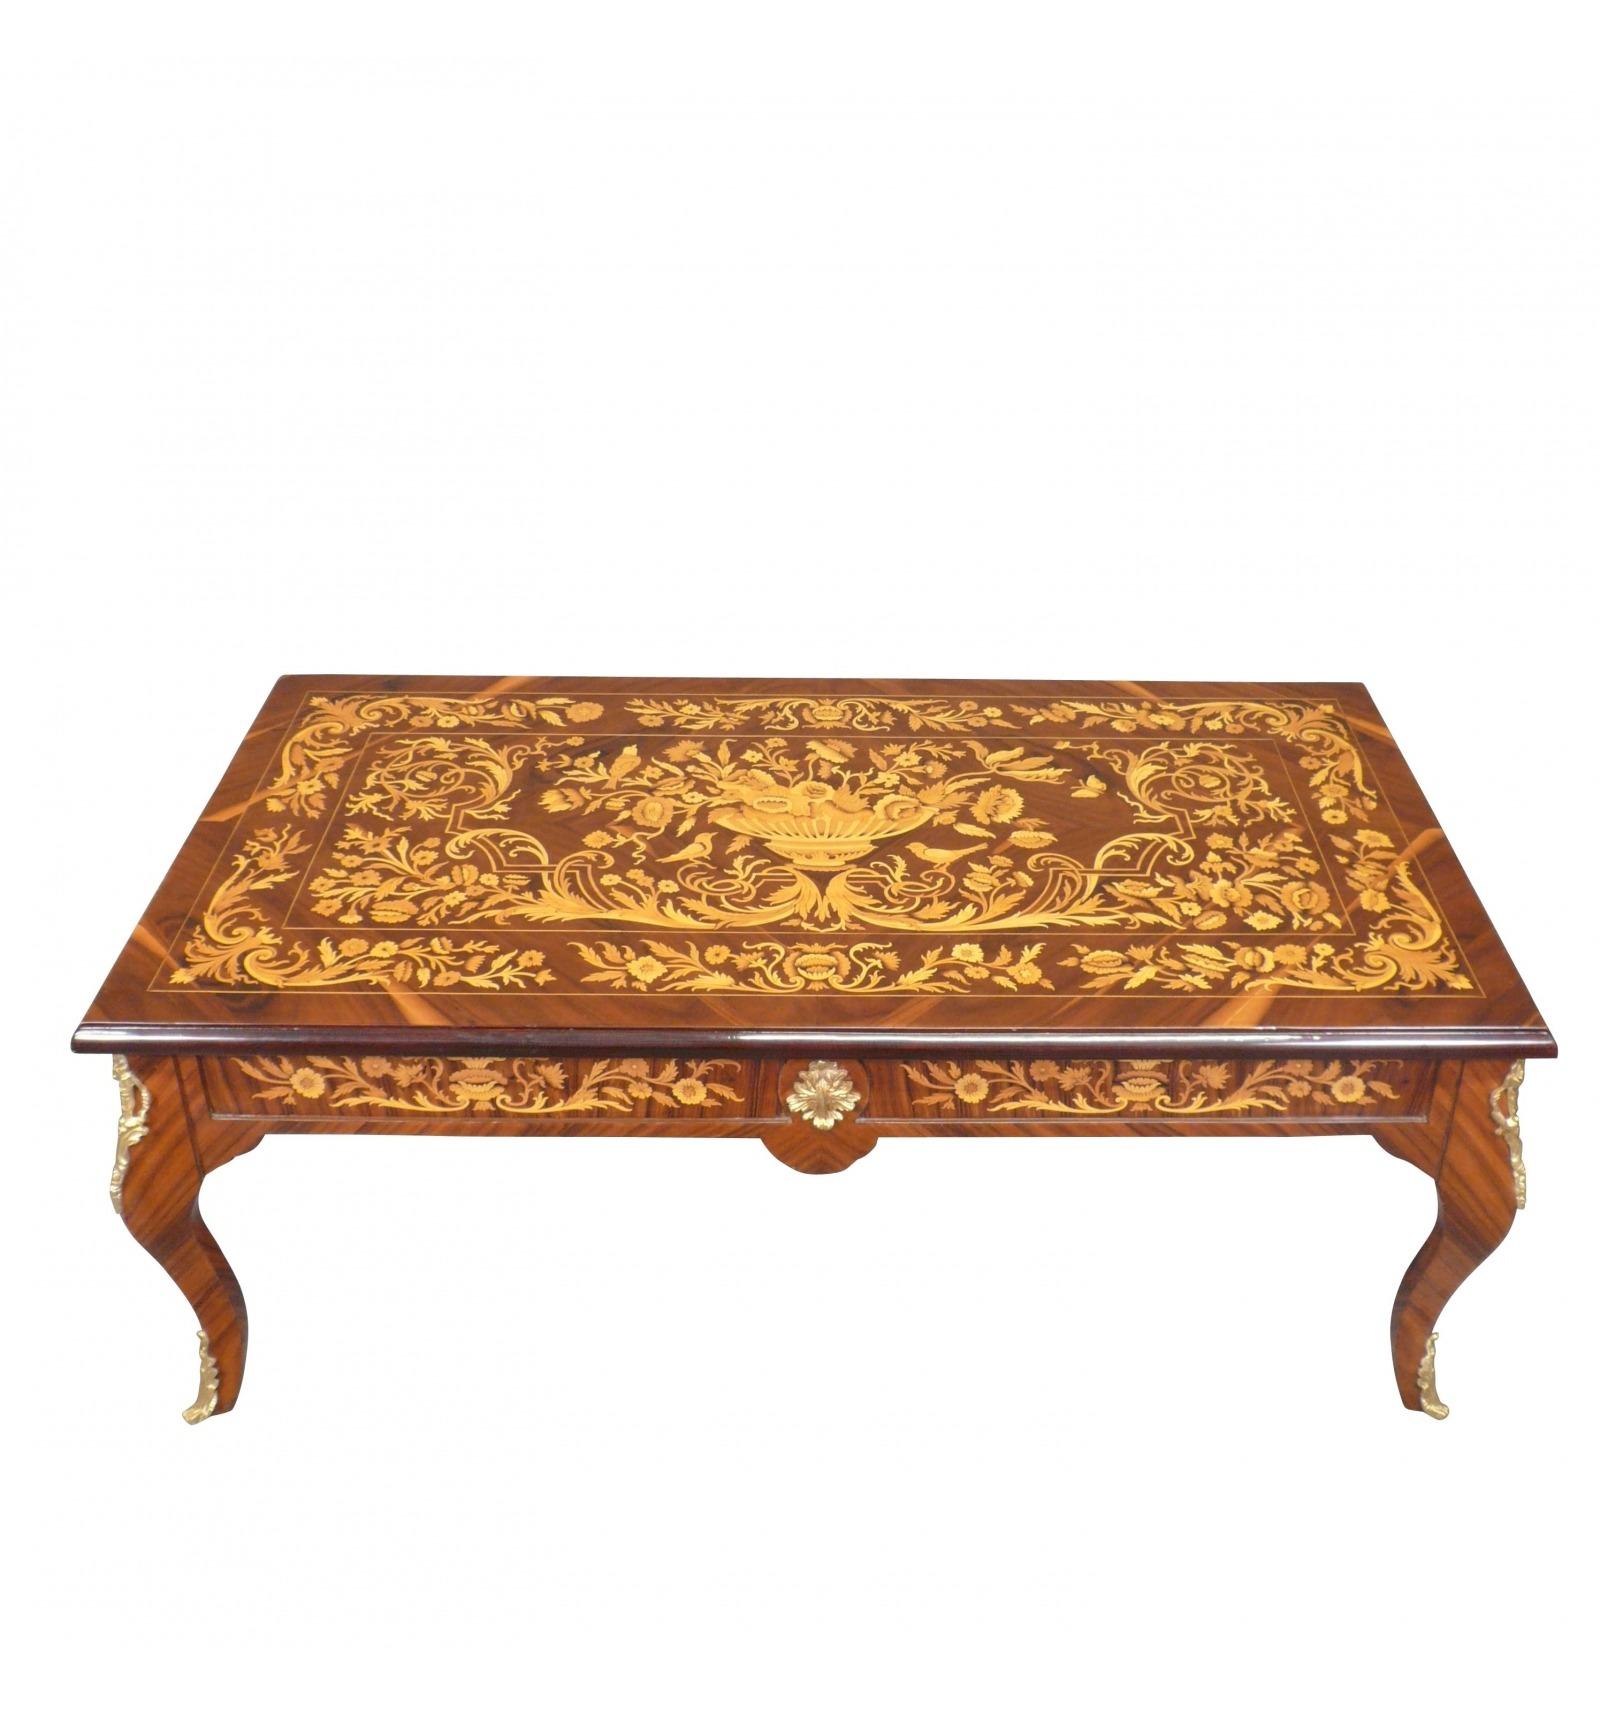 Table basse louis xv meubles style louis xv - Table basse style louis xv ...